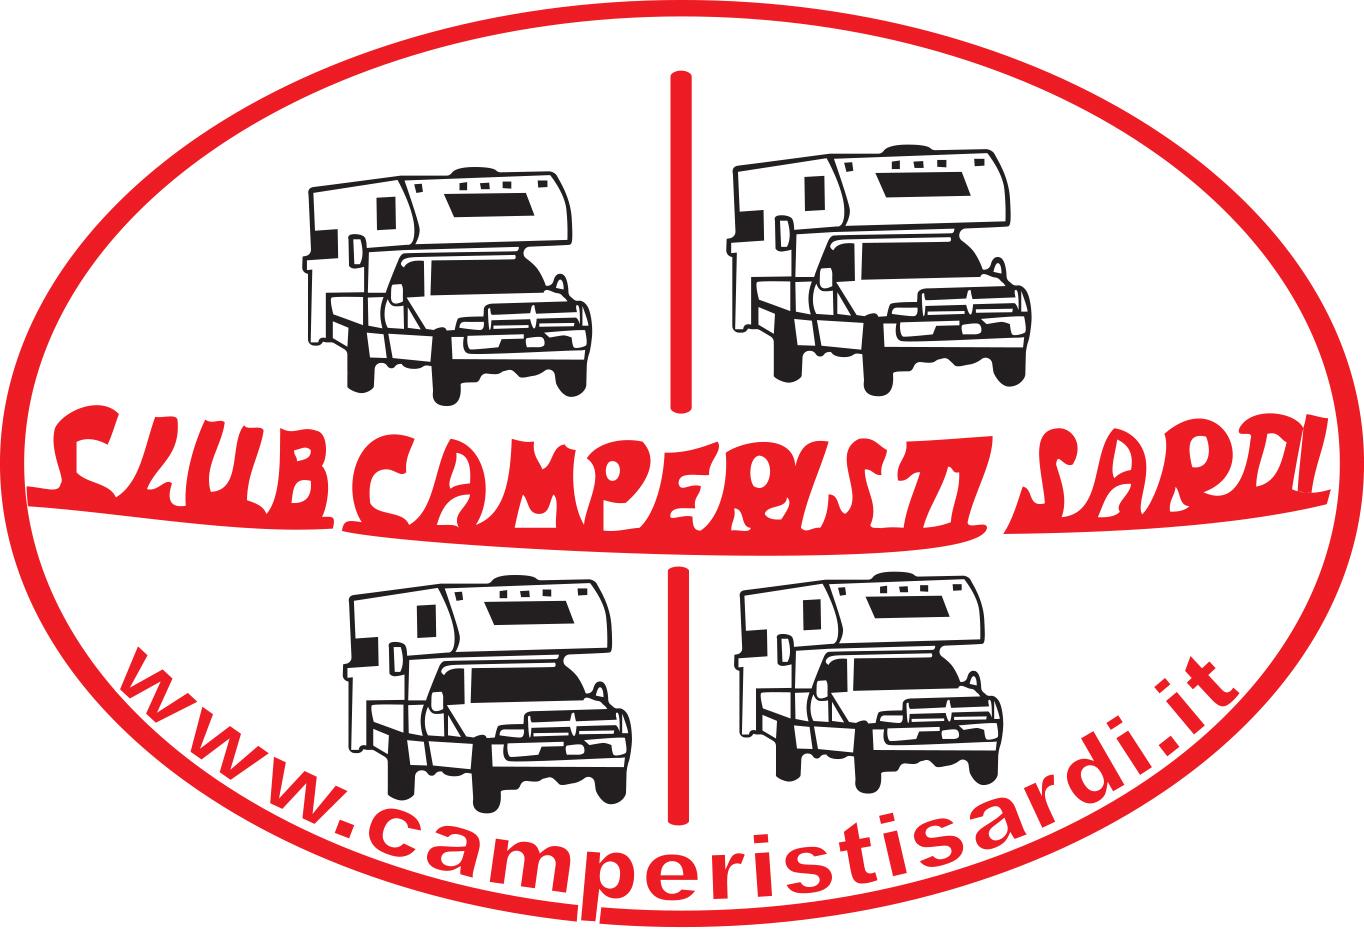 Logo camperisti alta def.jpg